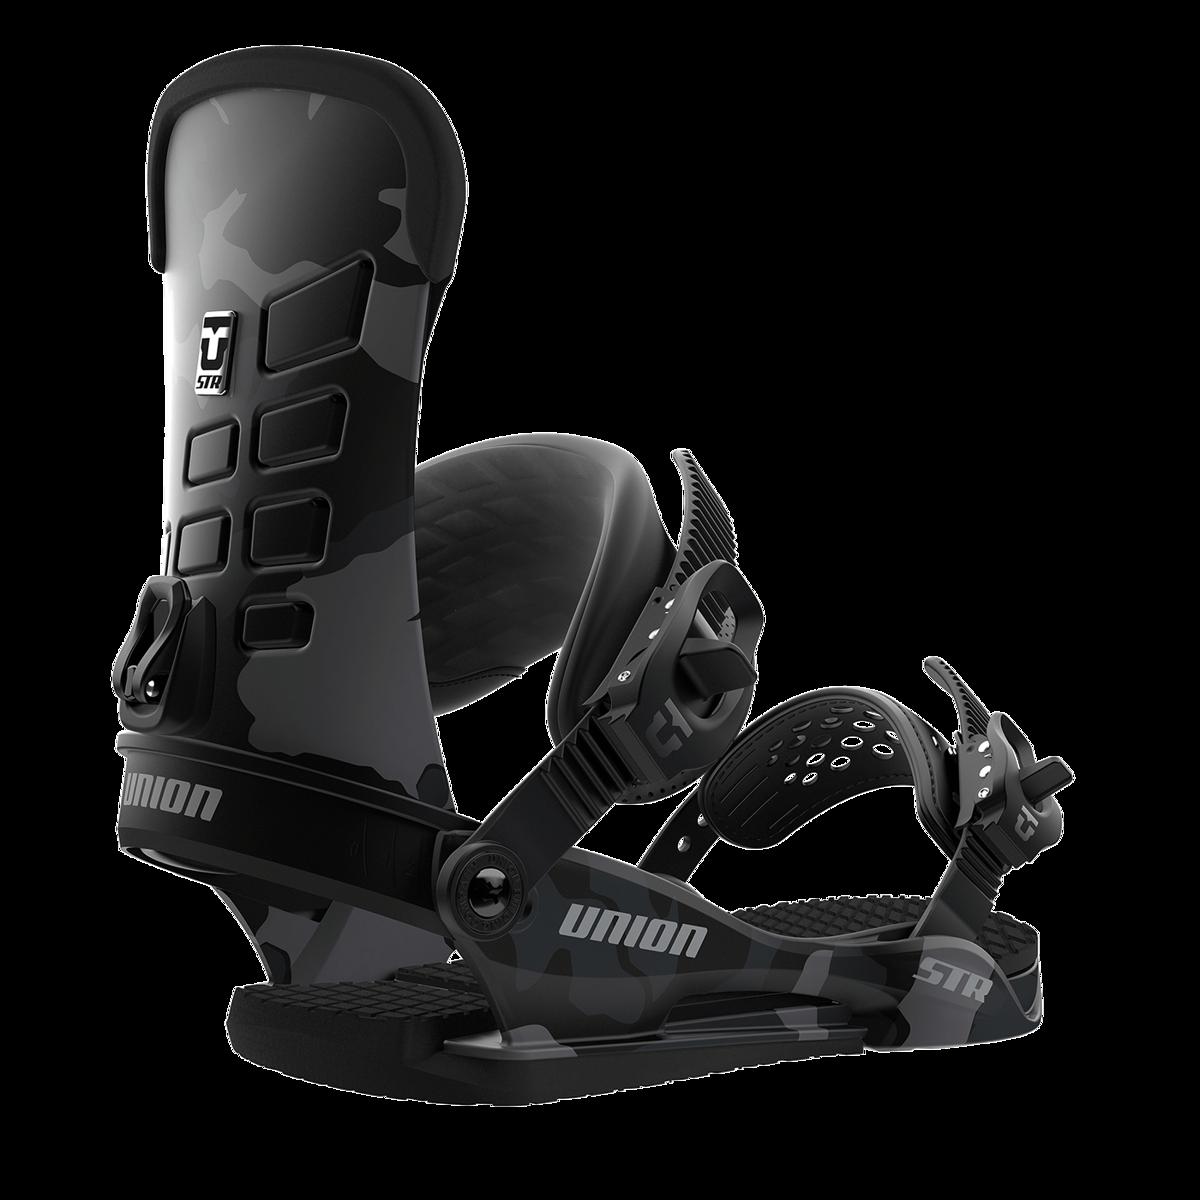 Snowboard Set: CAPITA Outerspace Living 160cm + UNION STR